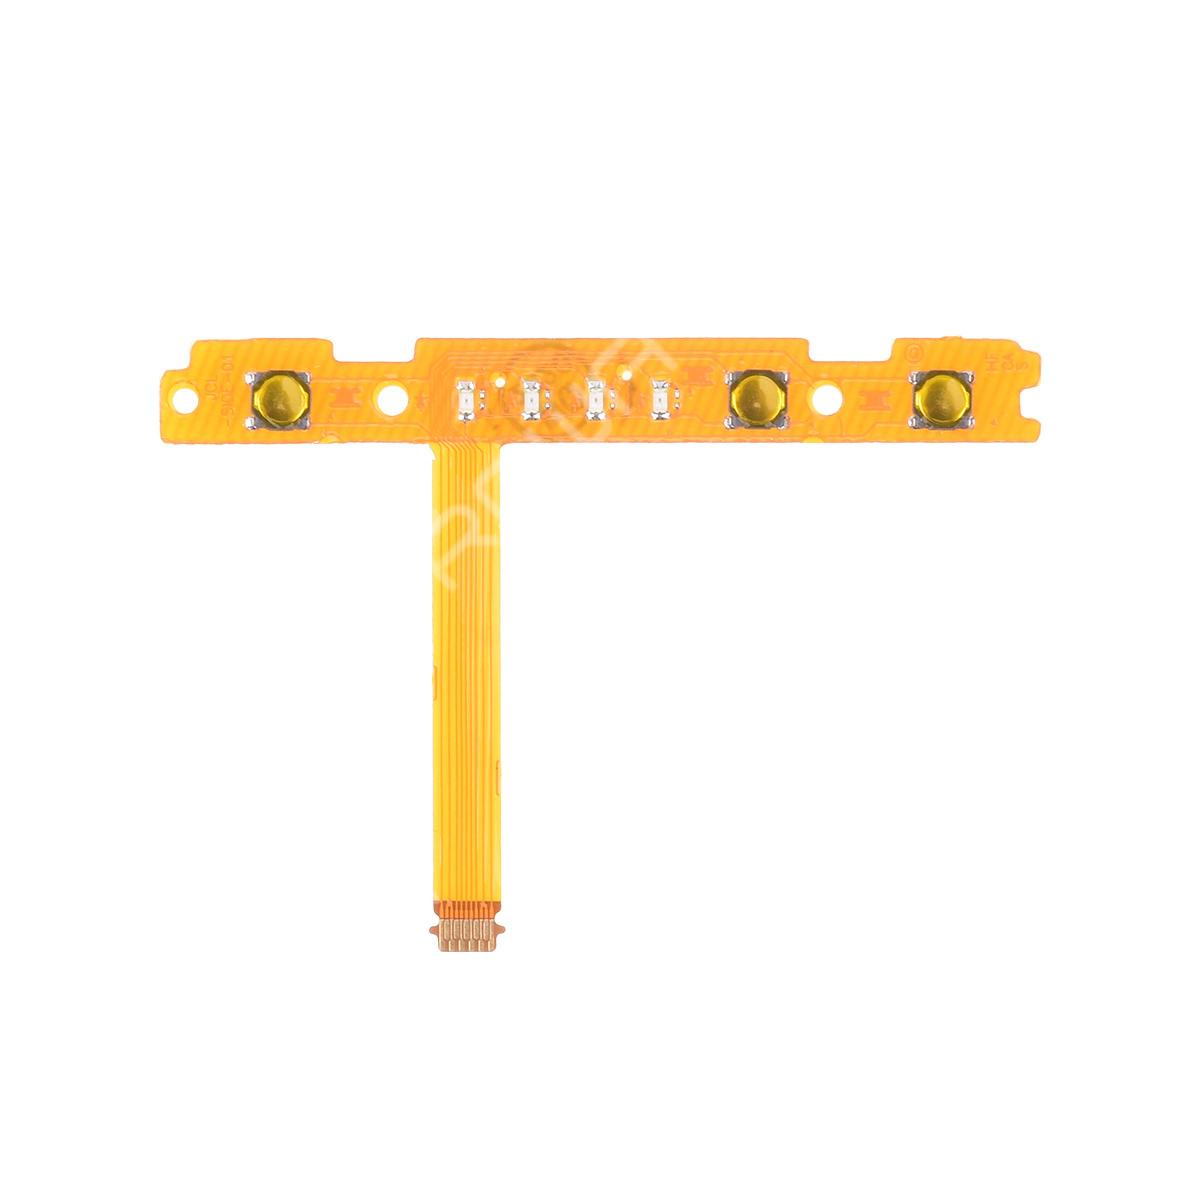 JOY-CON SR Button Flex Cable